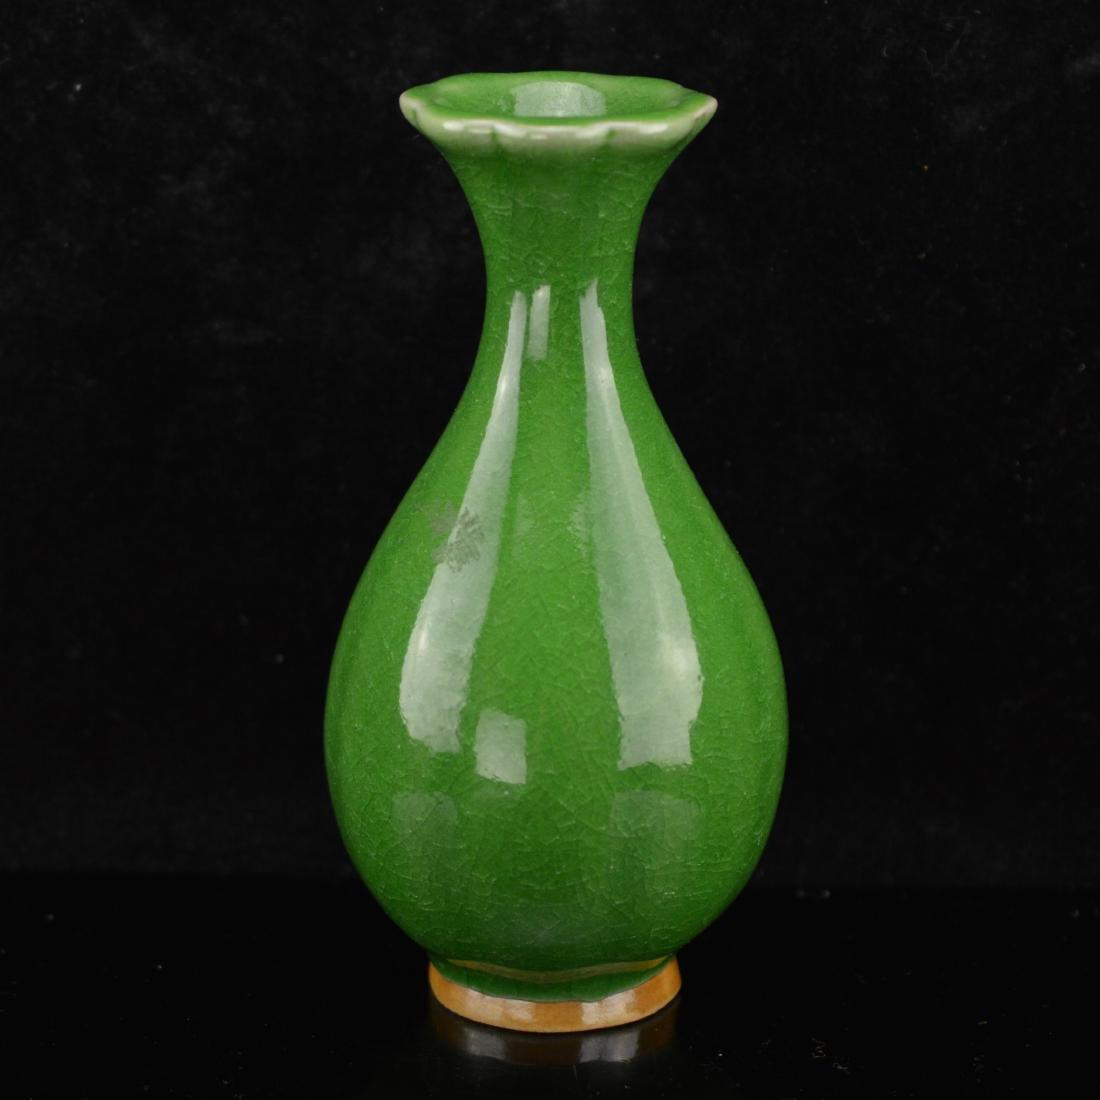 Green glazed porcelain vase